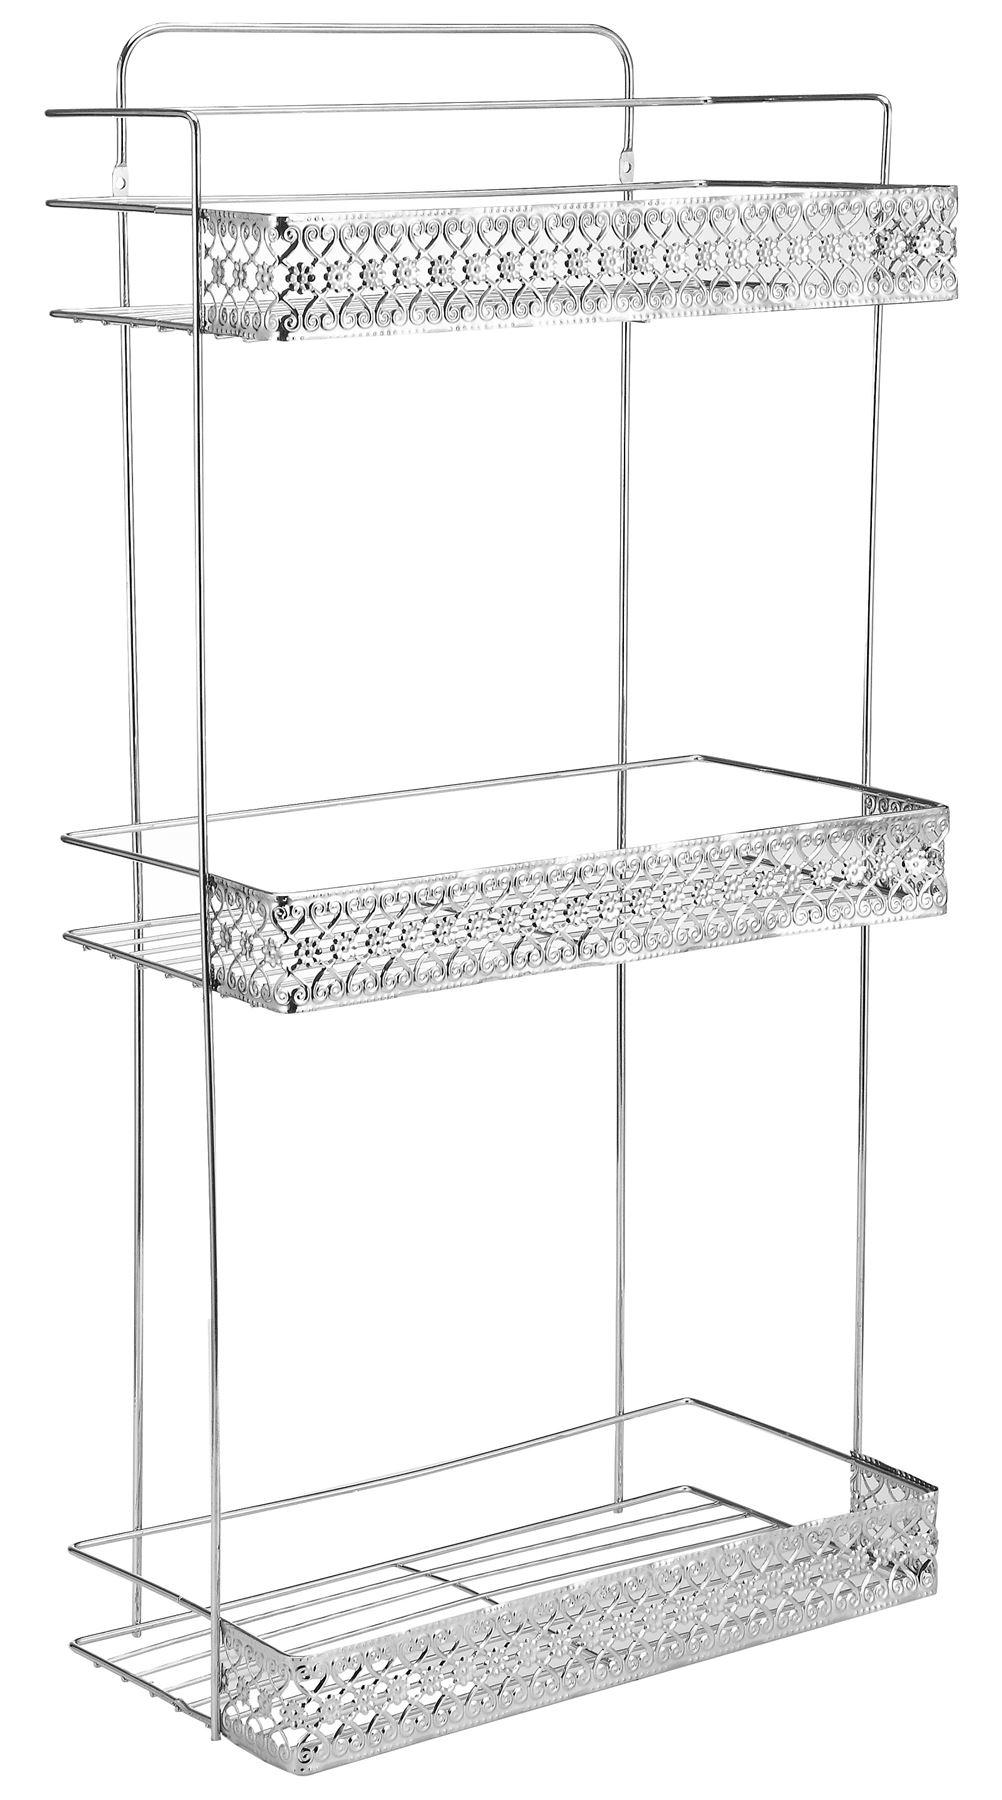 Chrome 3 Tier Corner Bathroom Shower Shelf Caddy Basket Tidy Organiser Rack